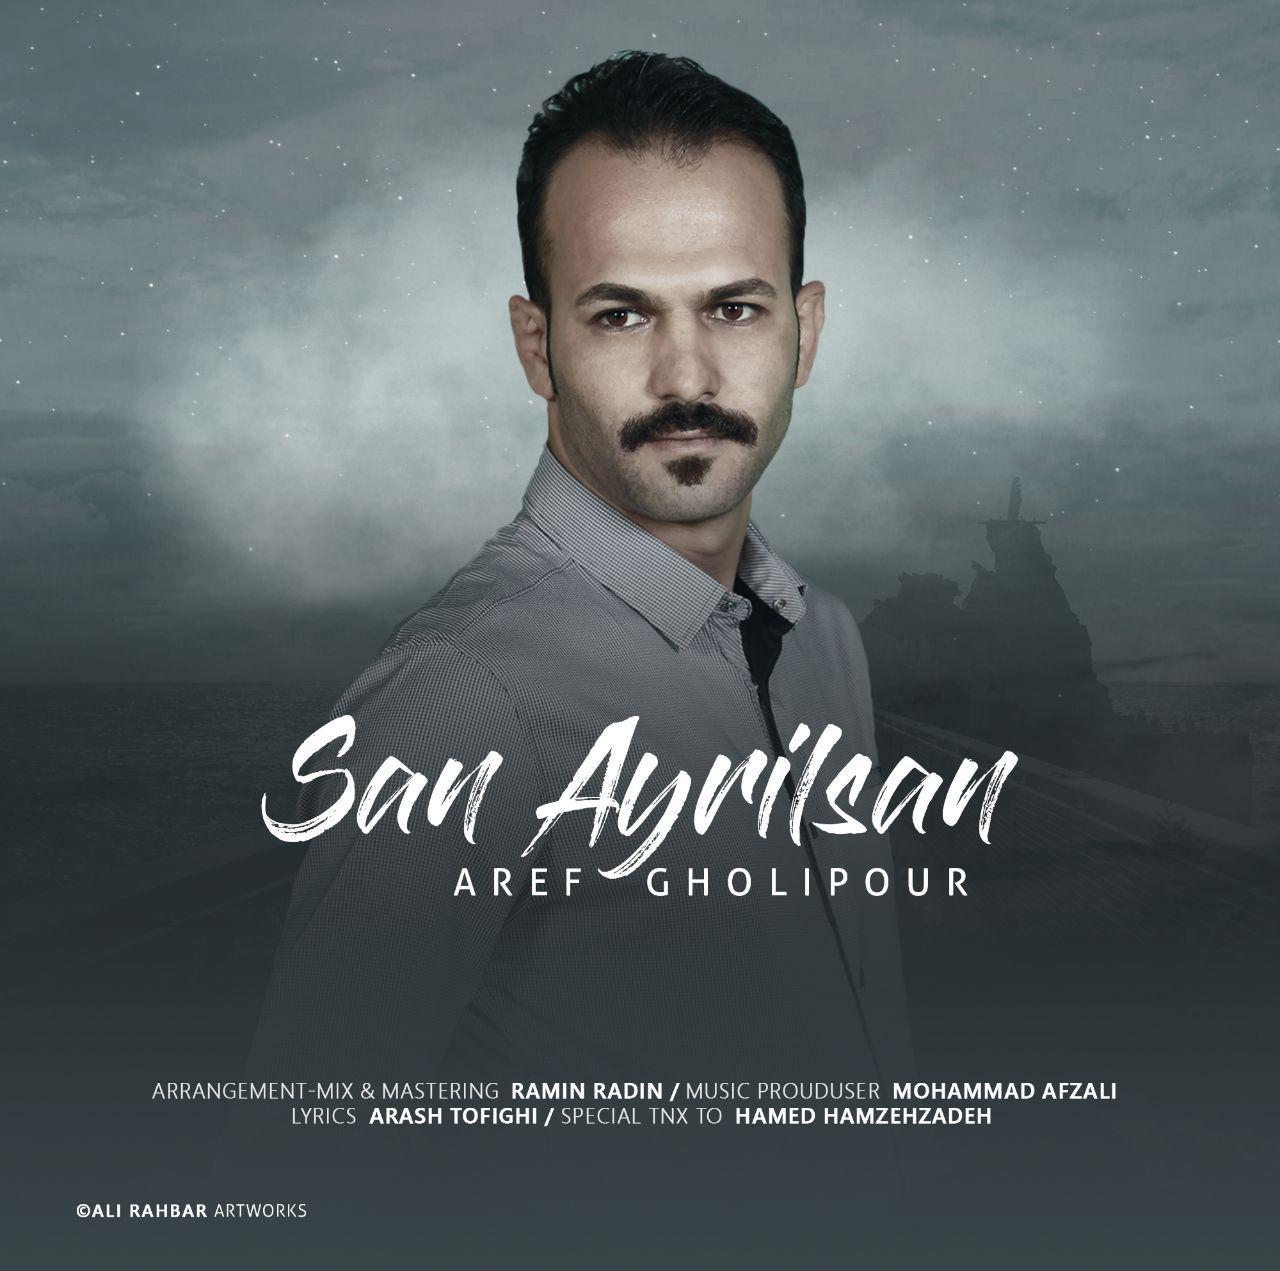 http://birtunes.ir/wp-content/uploads/2018/11/Aref-Gholipour-San-Ayrilsan.jpg